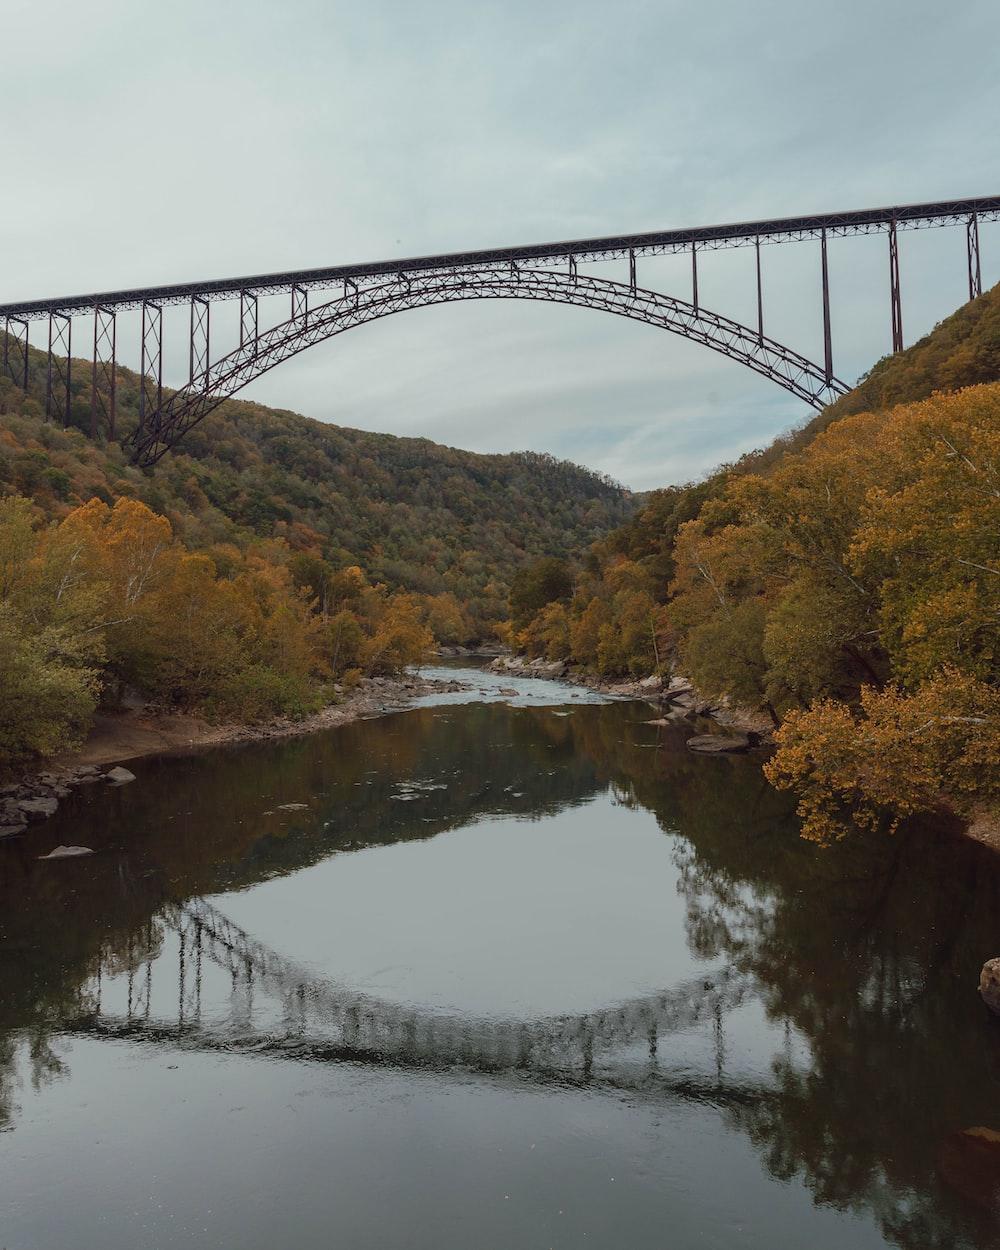 New River Gorge Bridge Arch bridge in Victor, Fayette County, West Virginia